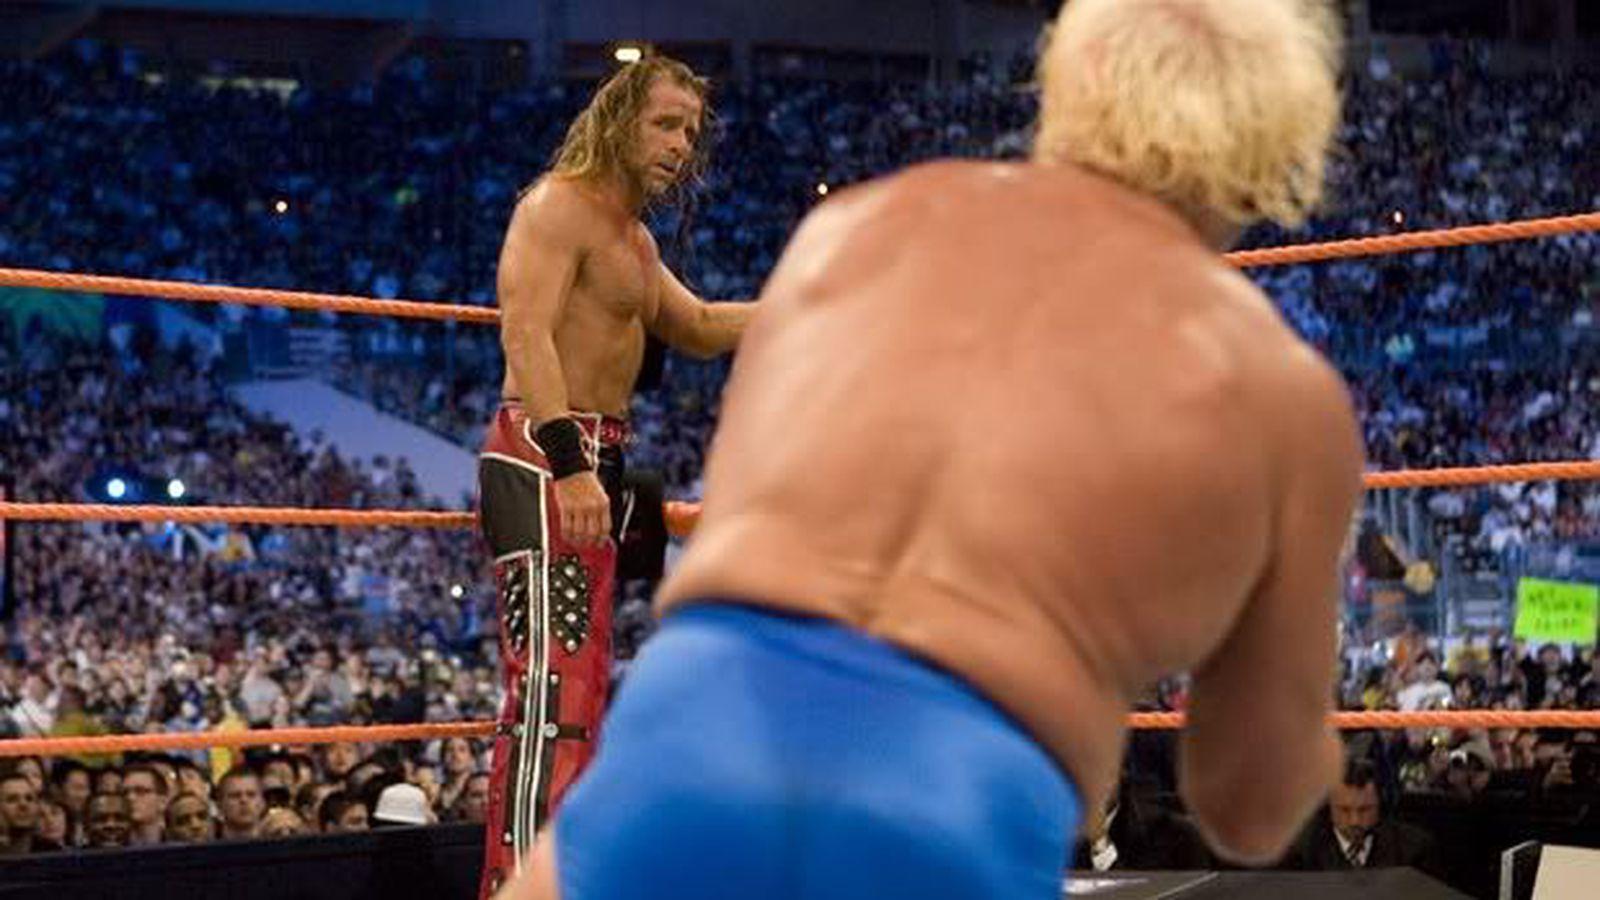 WATCH: Shawn Michaels vs. Ric Flair From WrestleMania XXIV